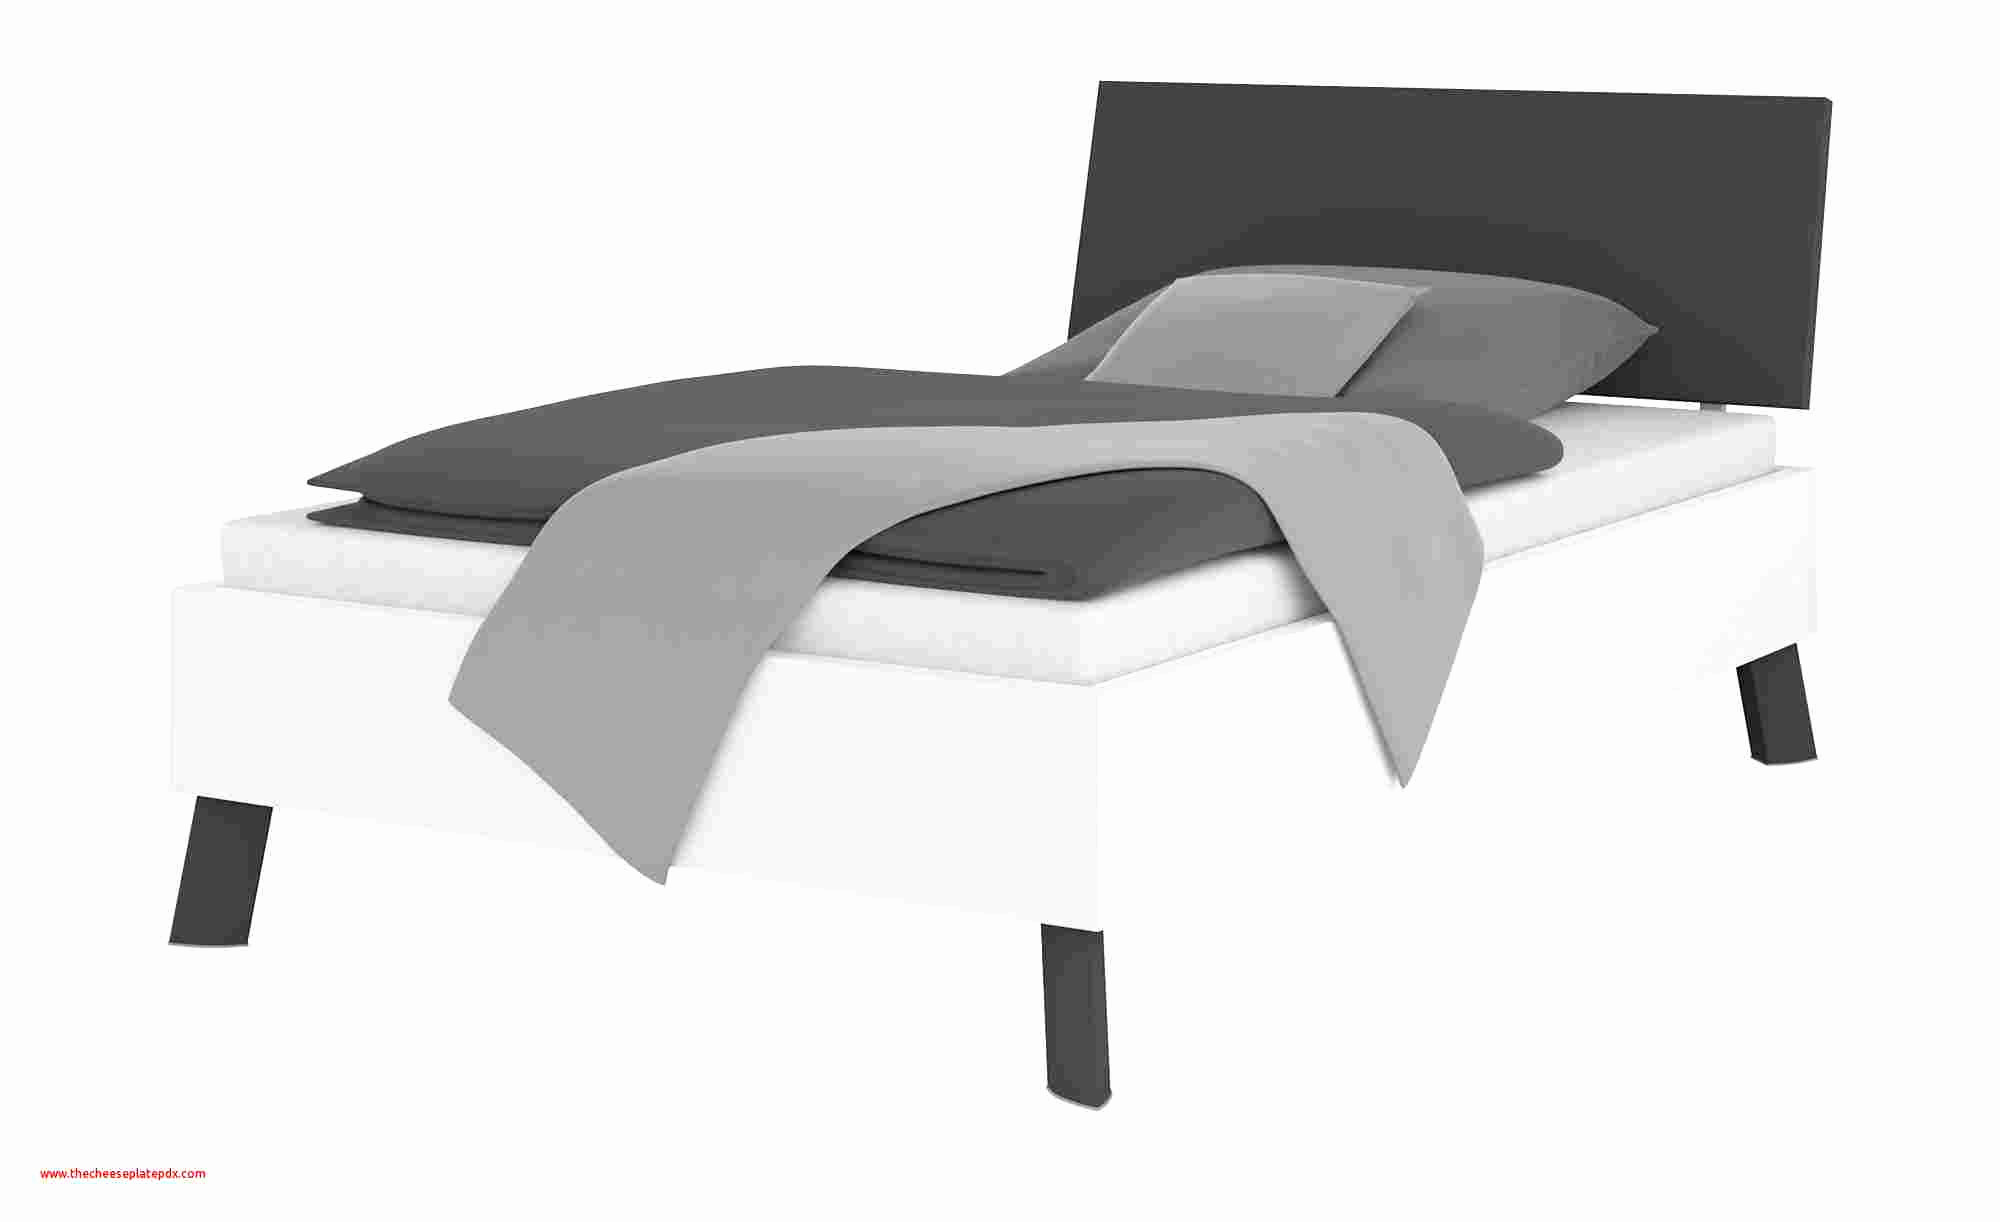 Full Size of Bett 120x200 Ikea 35 Lovely Pics F1 Anleitung Beste Mbelideen Schwarz Weiß Mit Schubladen 180x200 Betten überlänge Japanisches Mädchen Bei Joop 200x200 Wohnzimmer Bett 120x200 Ikea